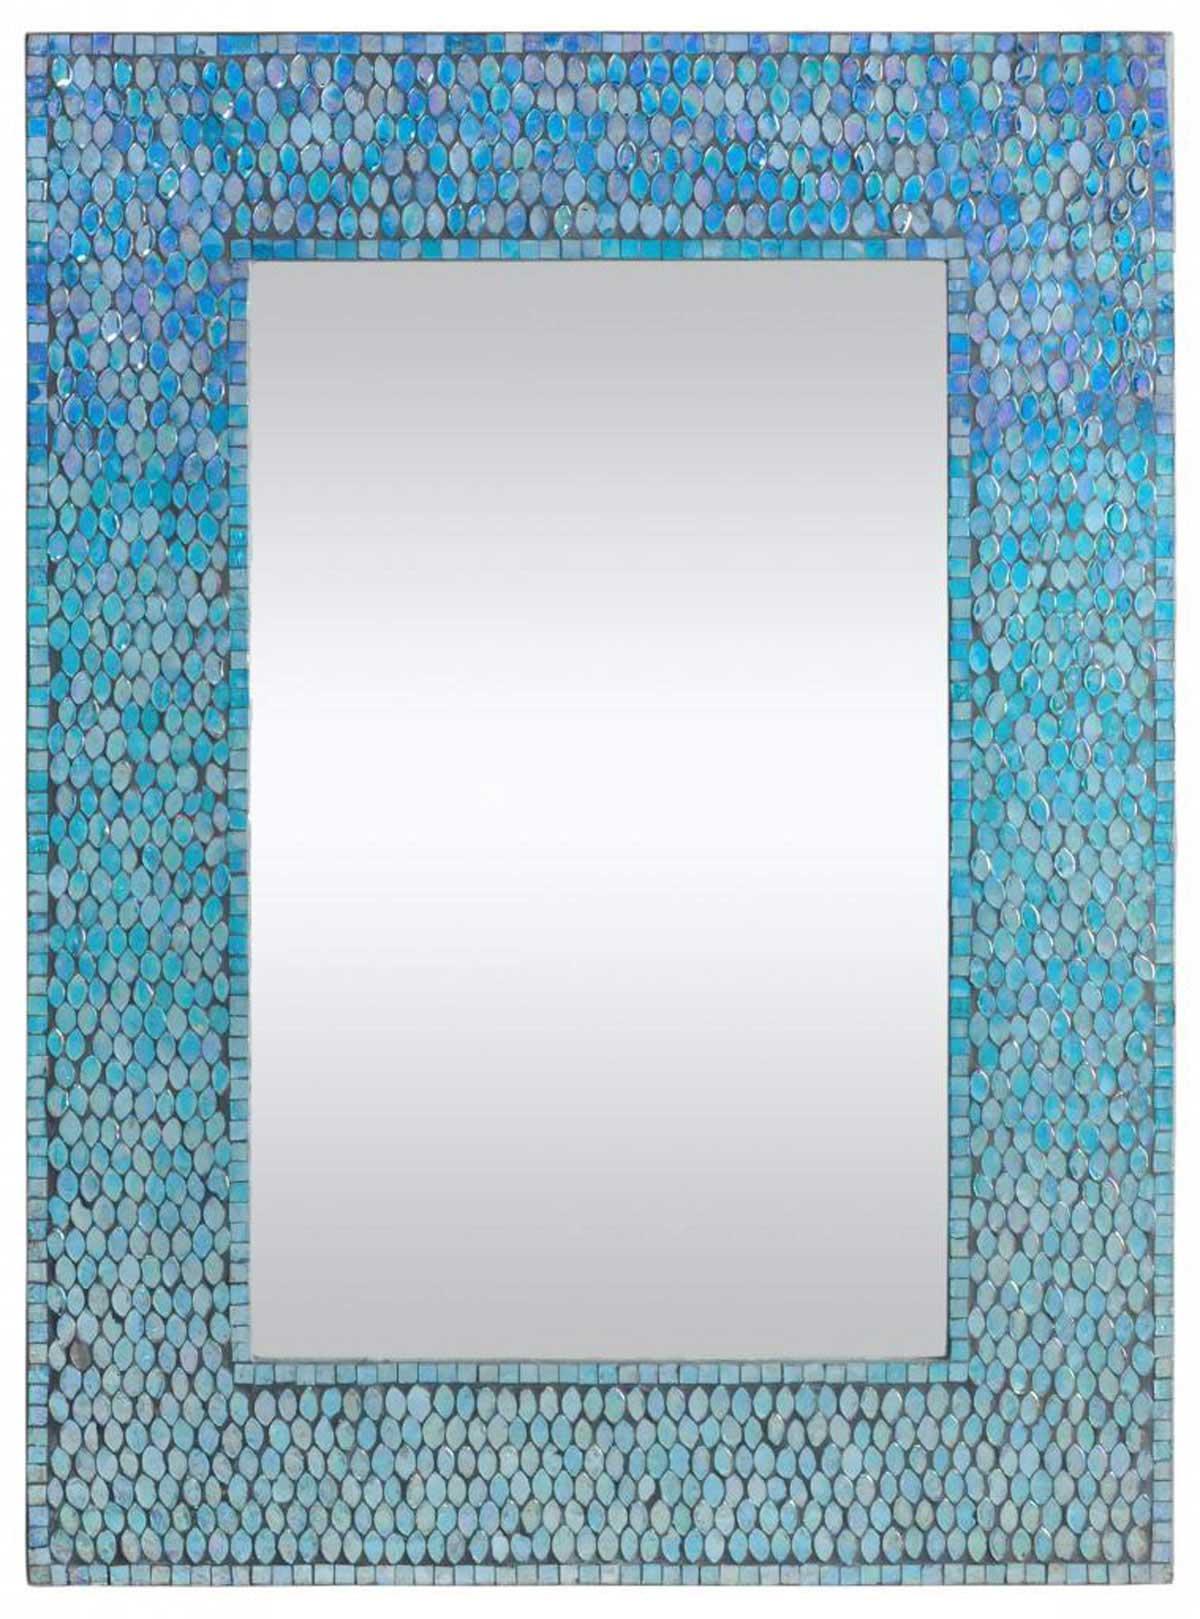 Ren-Wil Catarina Mirror - Mosaic